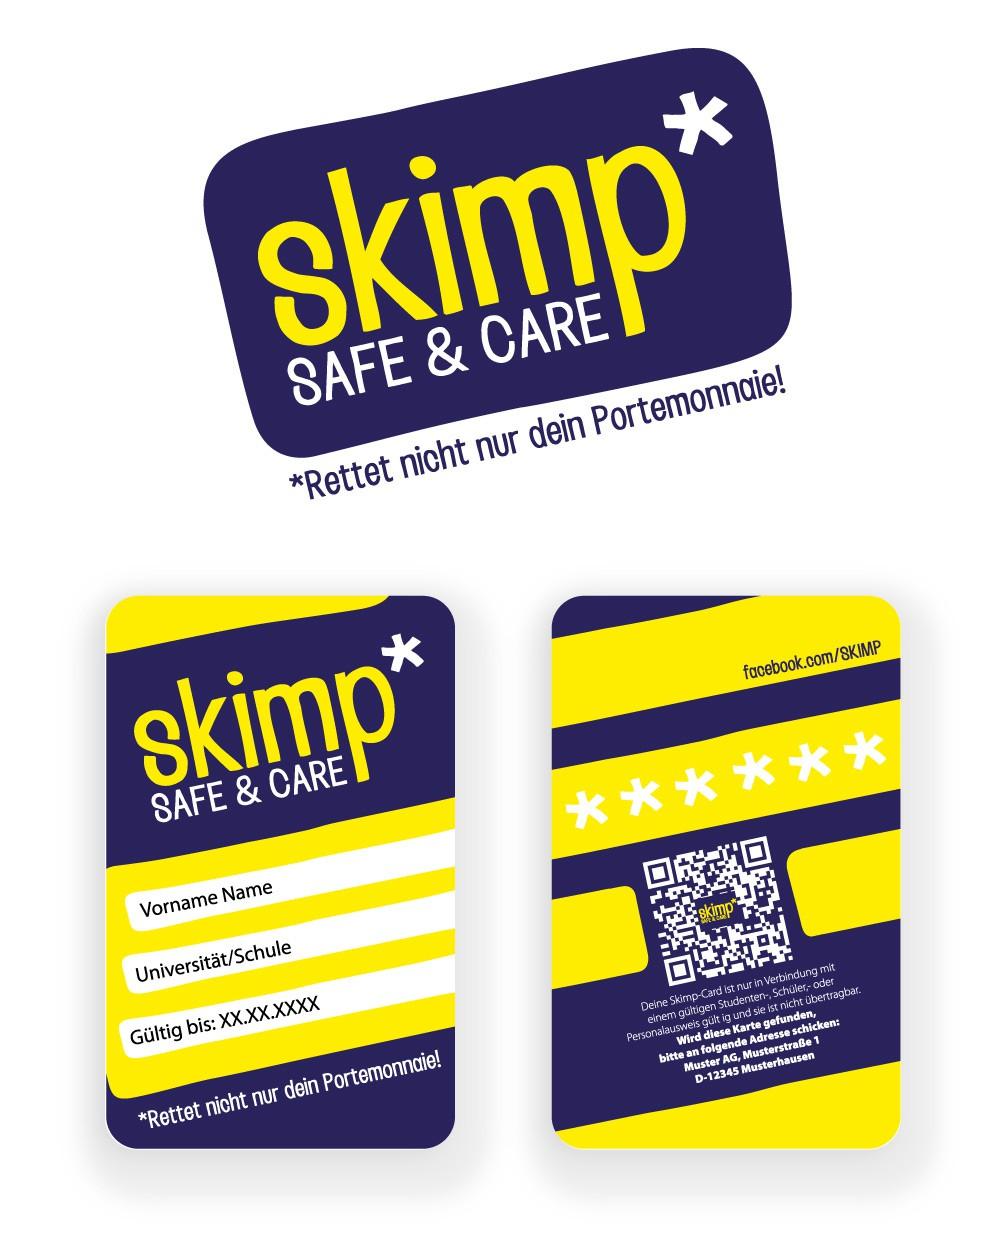 RheinMain, Card, Rabatt, Education, Bildung, Student, Schüler benötigt logo and business card